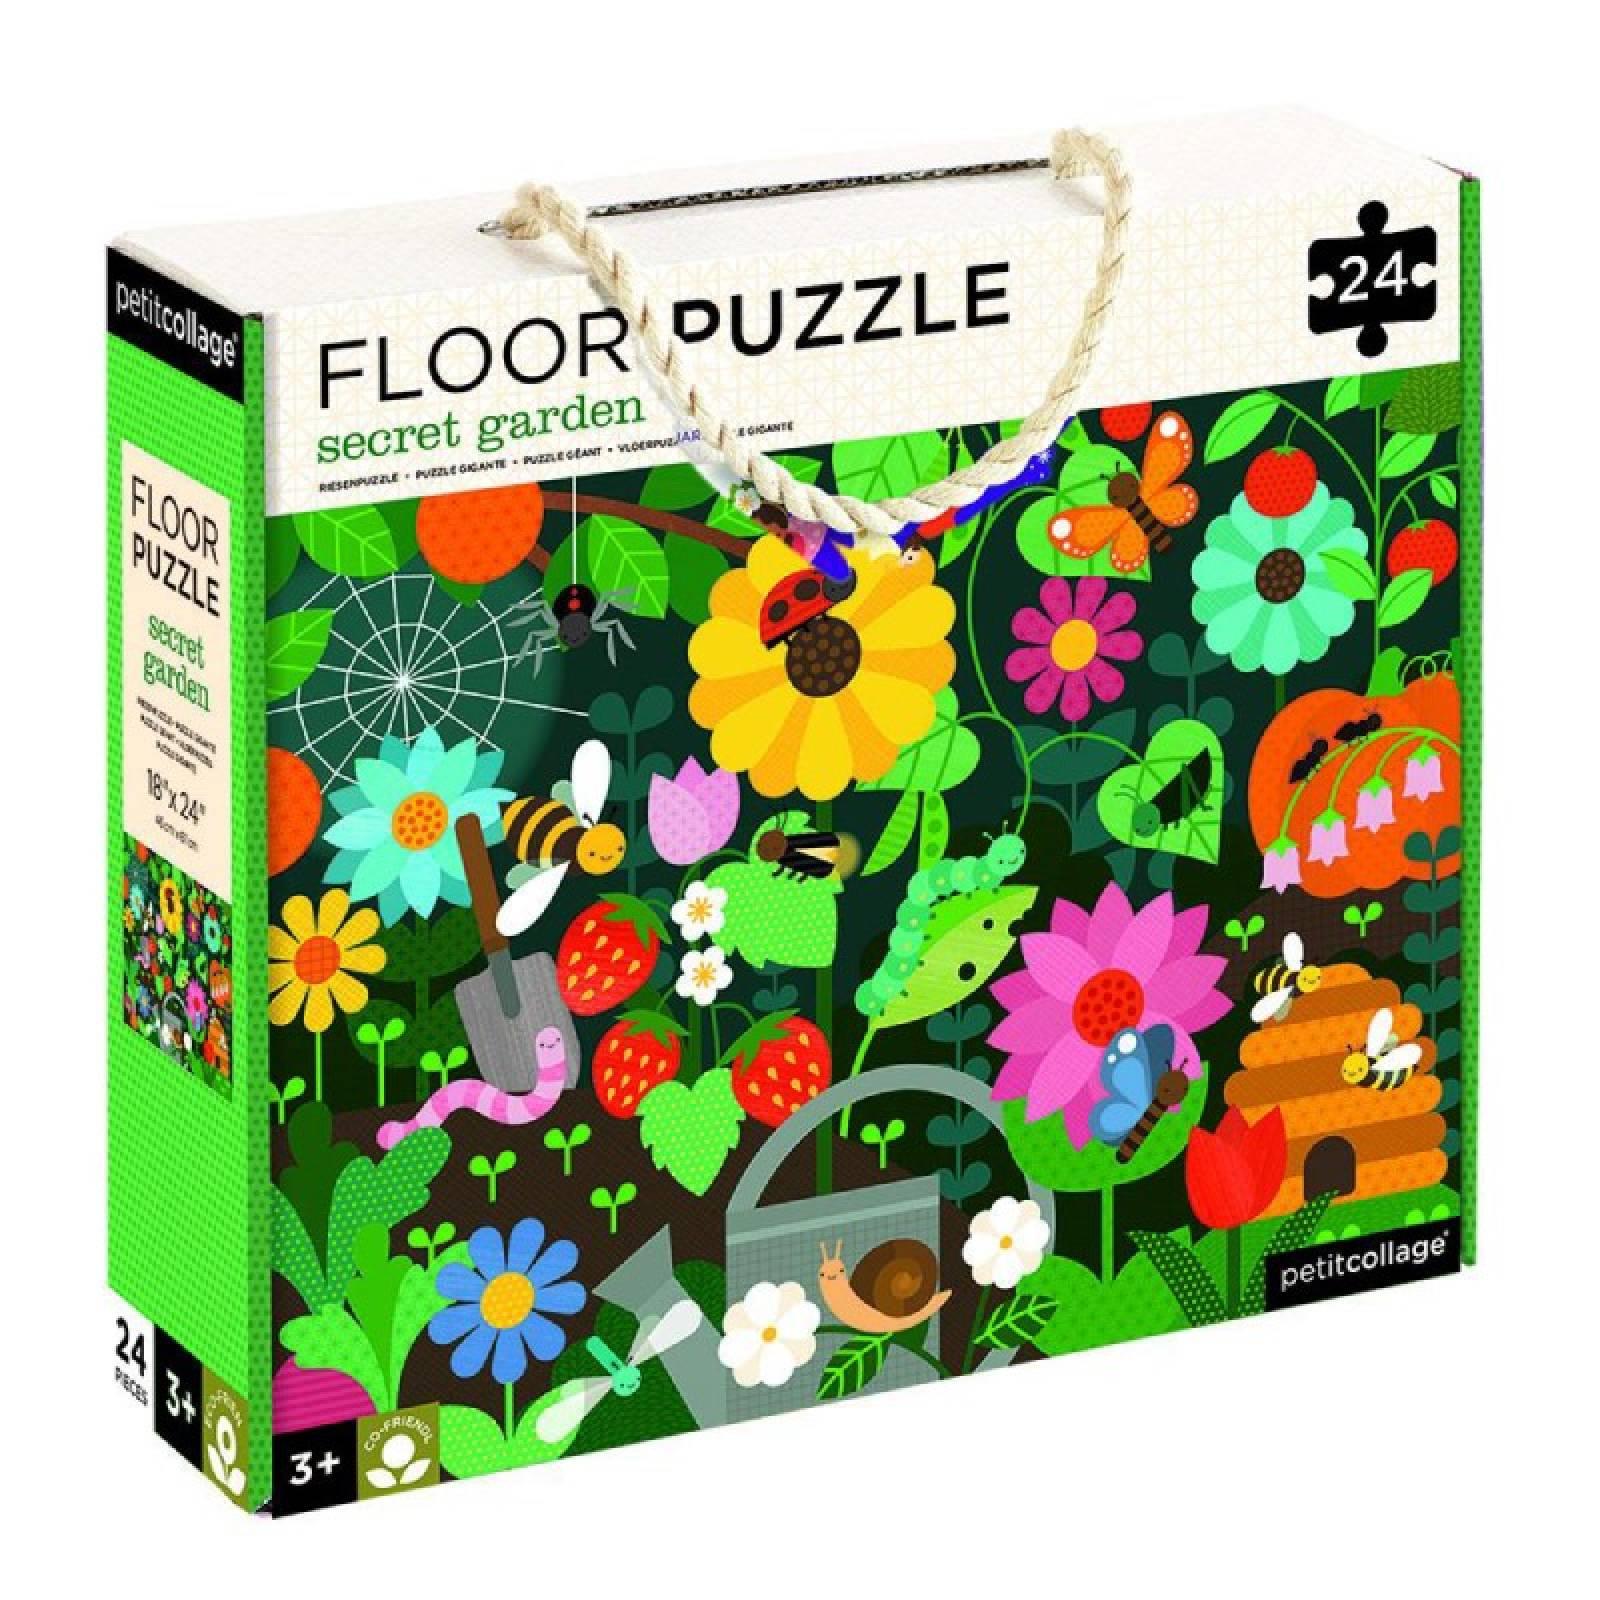 Secret Garden Floor Puzzle 24pc 3+